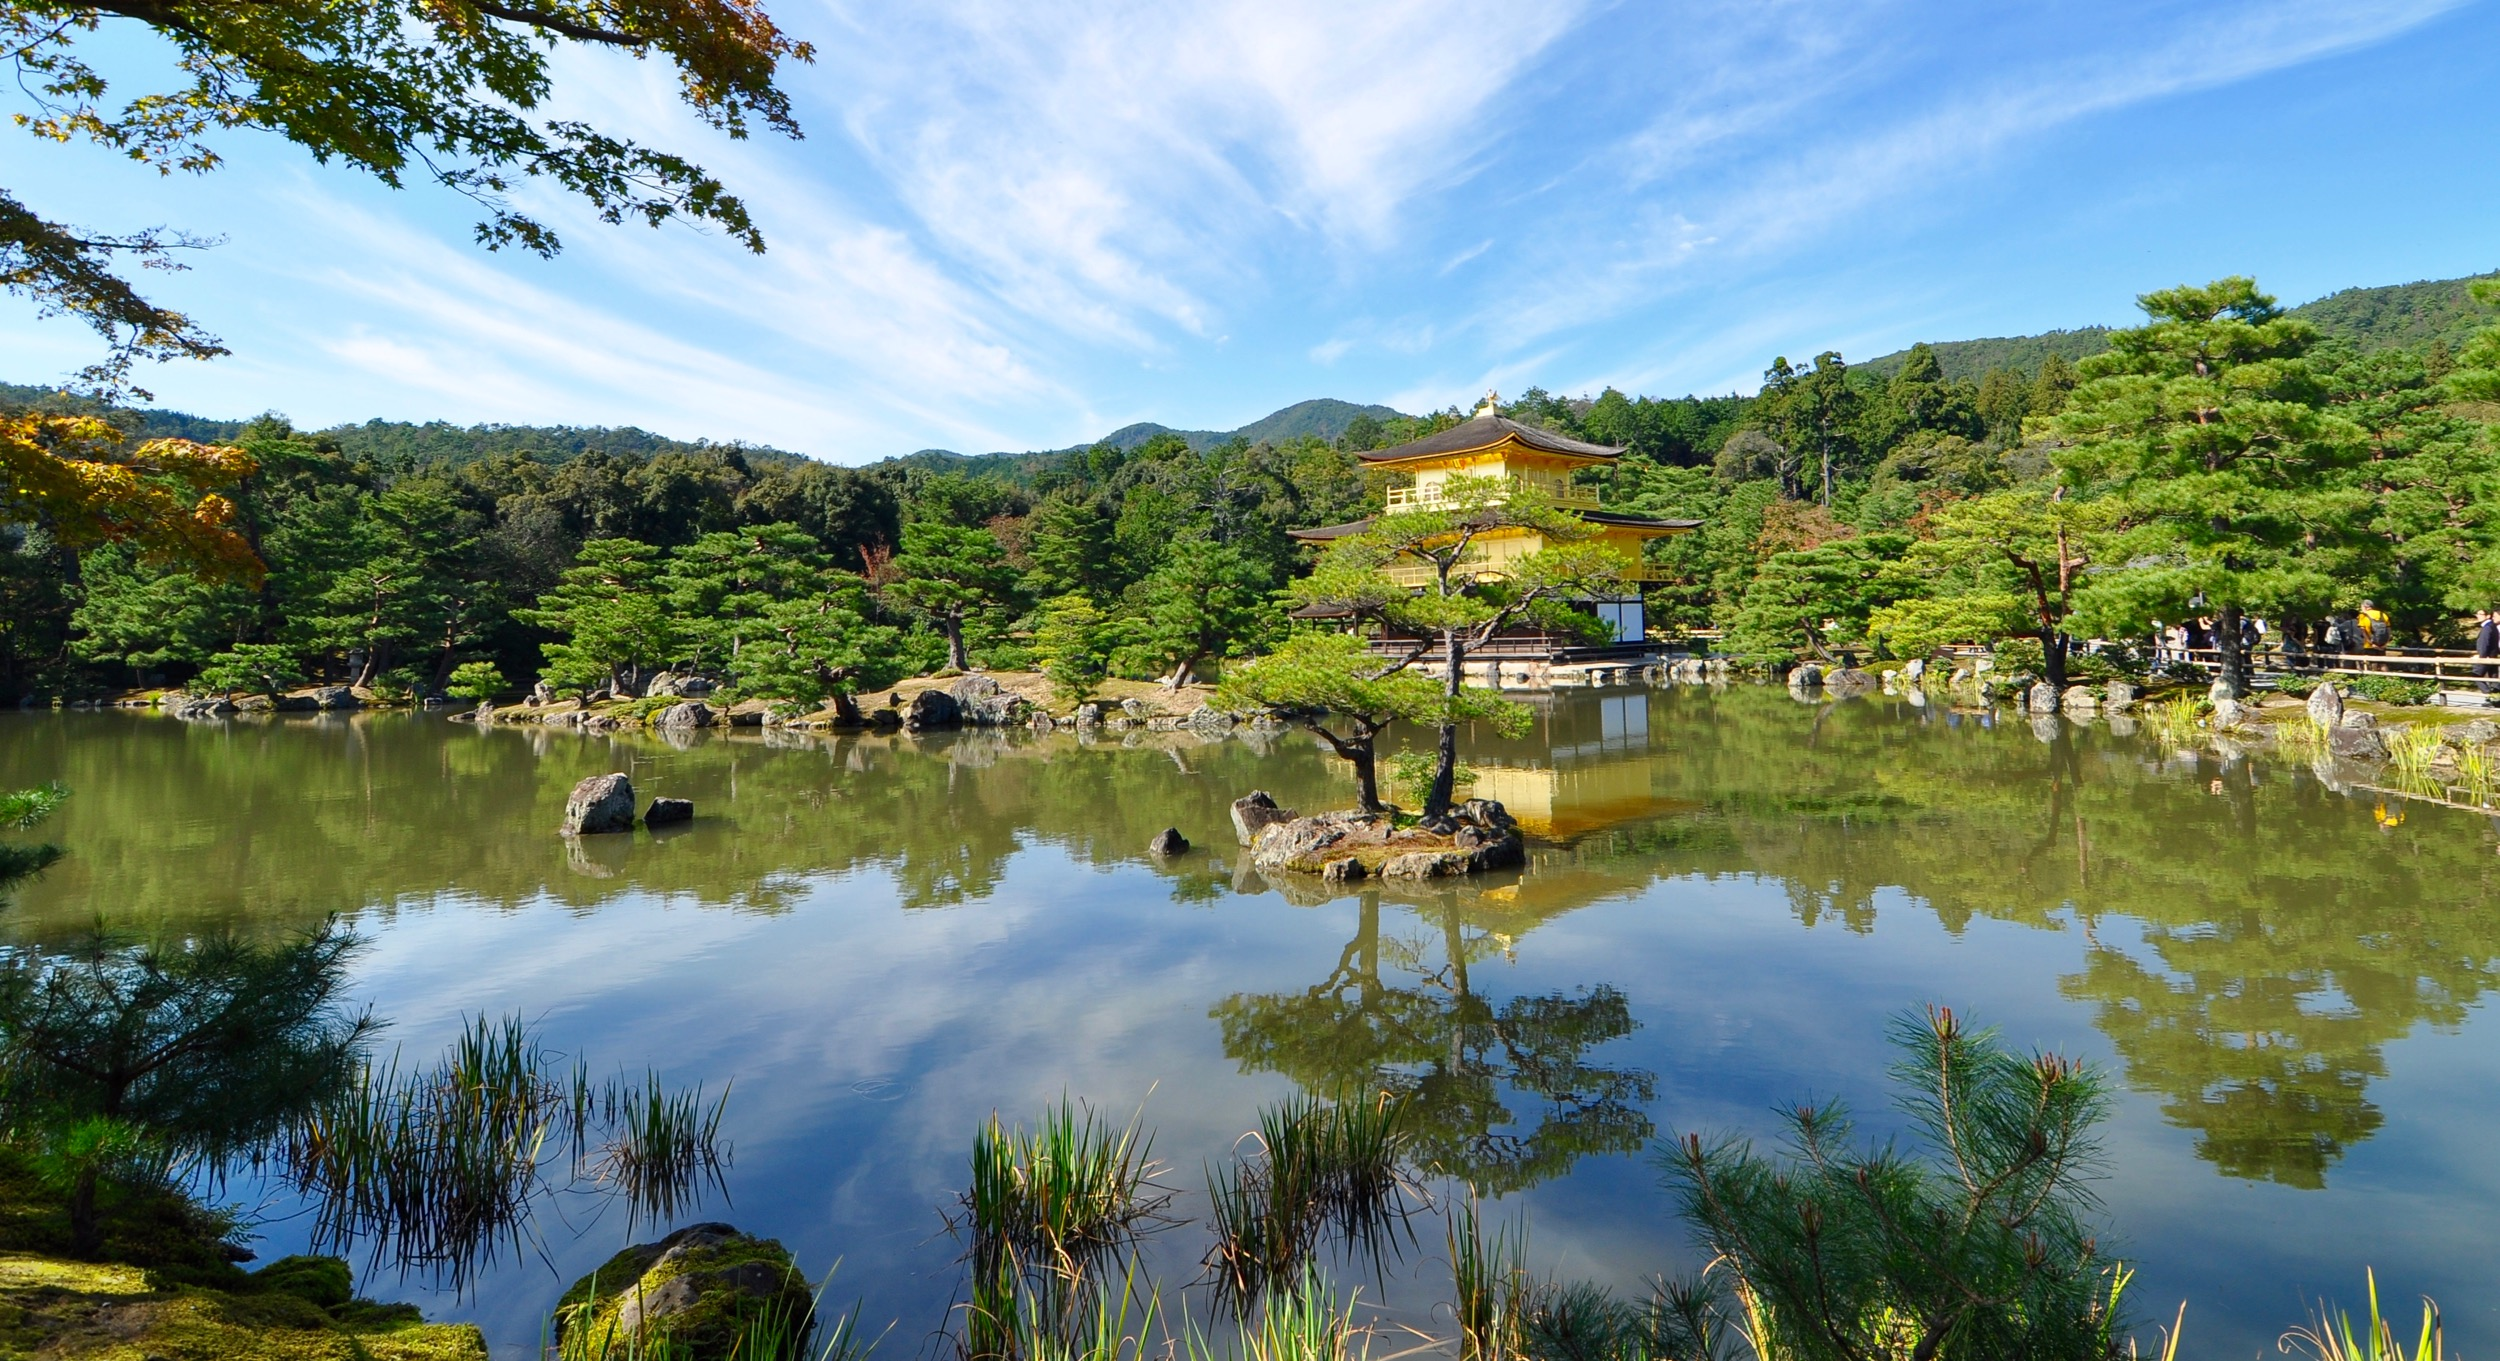 Golden Pavilion, Kinkaku-ji, in early autumn 2016. All photos: Daniel Hurst